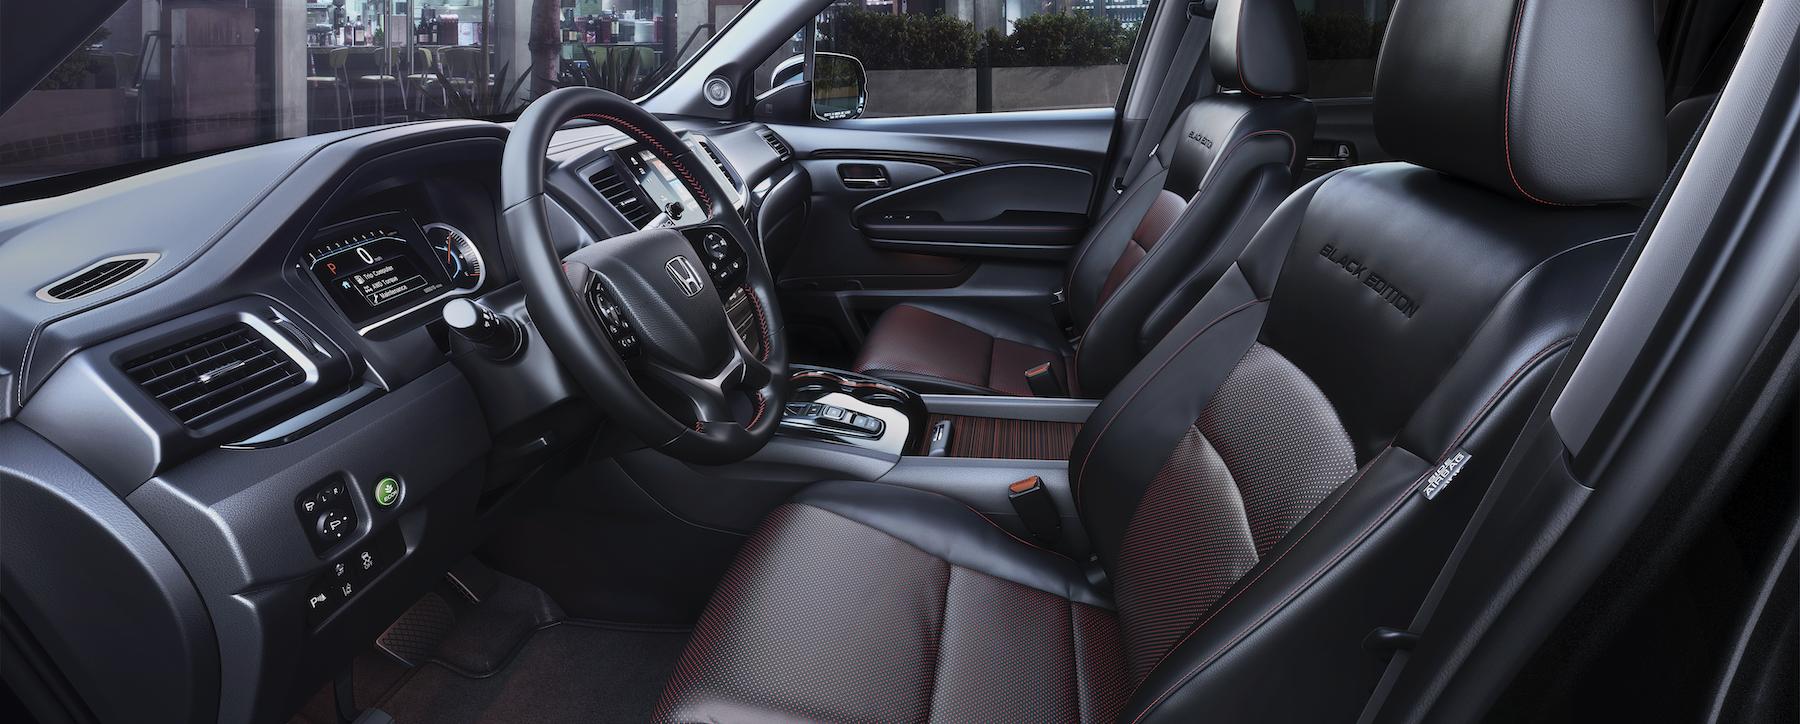 Compare the 2020 Honda Pilot and 2020 Subaru Ascent at Boch Honda of Norwood MA | The interior of the black honda pilot